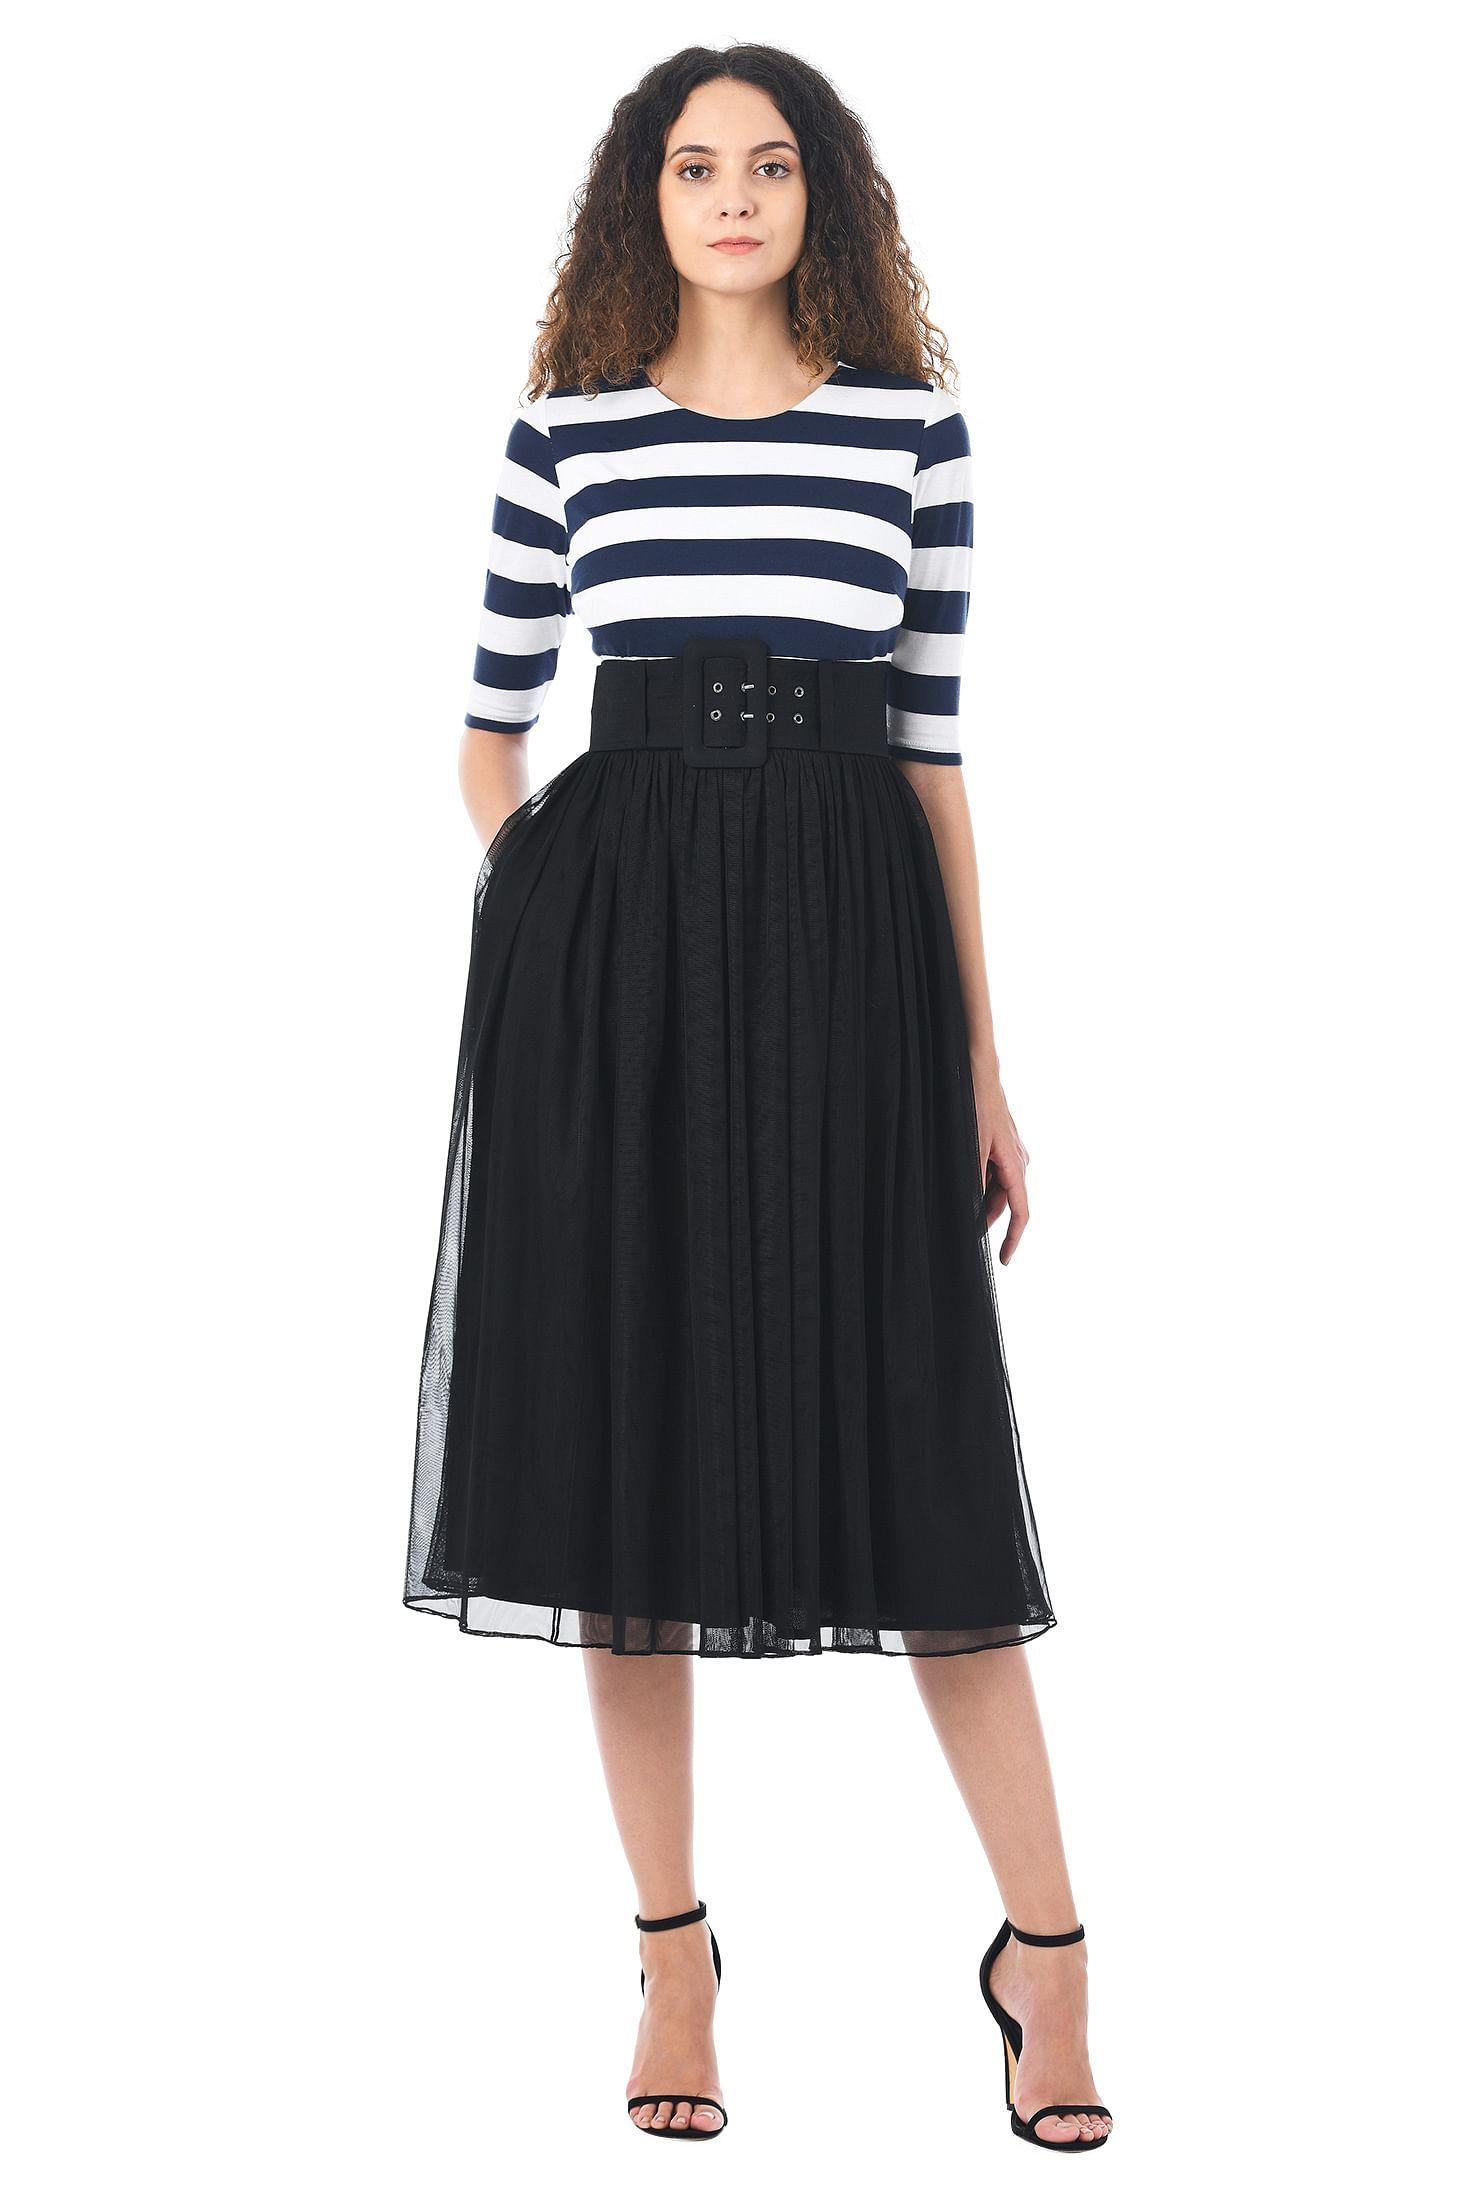 107a21a79b75 black dresses, cotton/spandex Dresses, elbow length sleeve dresses, Full  skirt